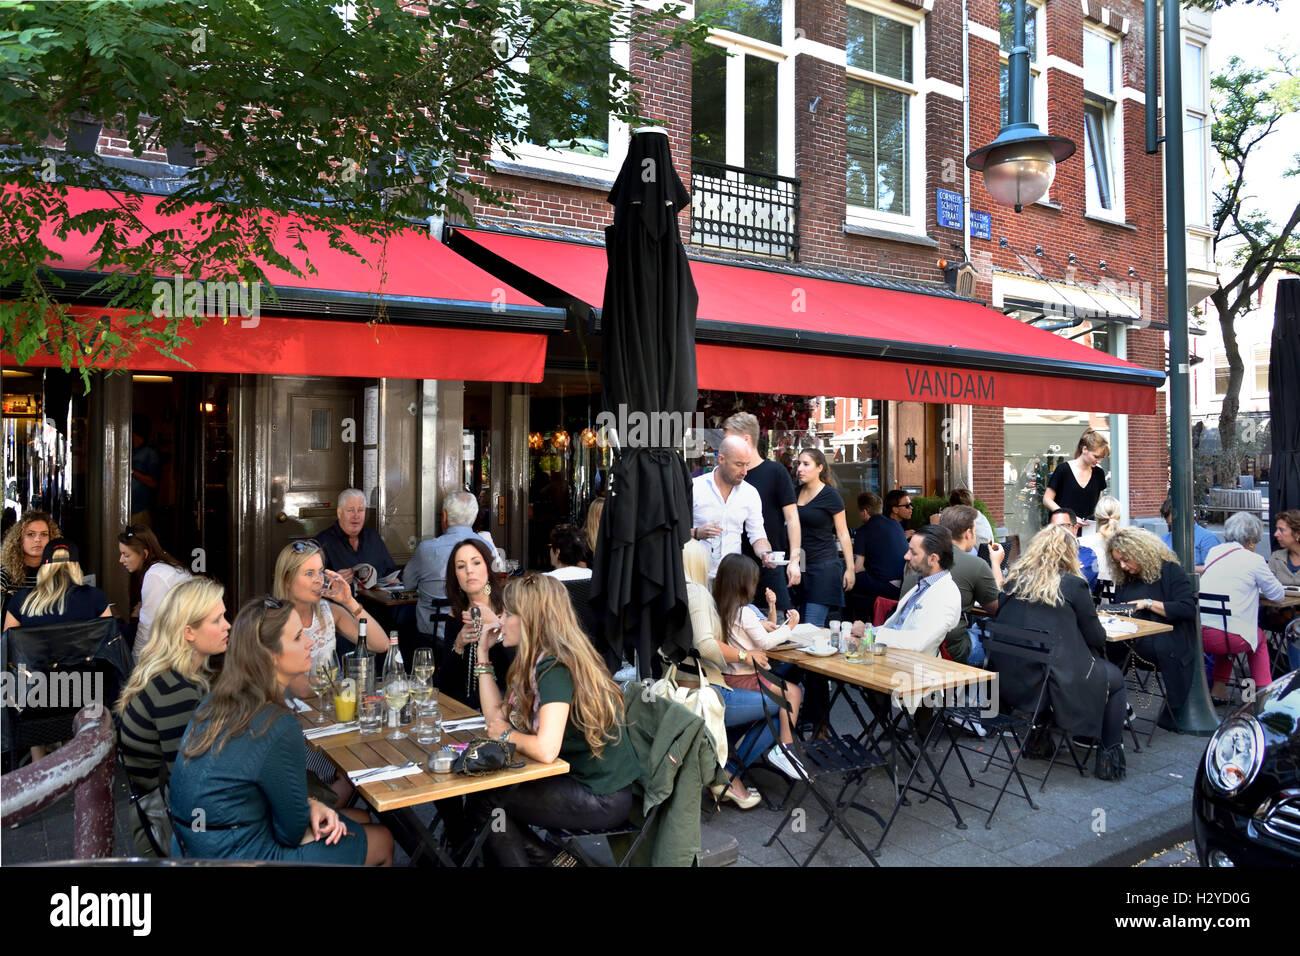 Restaurante Brasserie francesa Van Dam Cornelis Schuytstraat Oud Zuid holandés Amsterdam Países Bajos Foto de stock